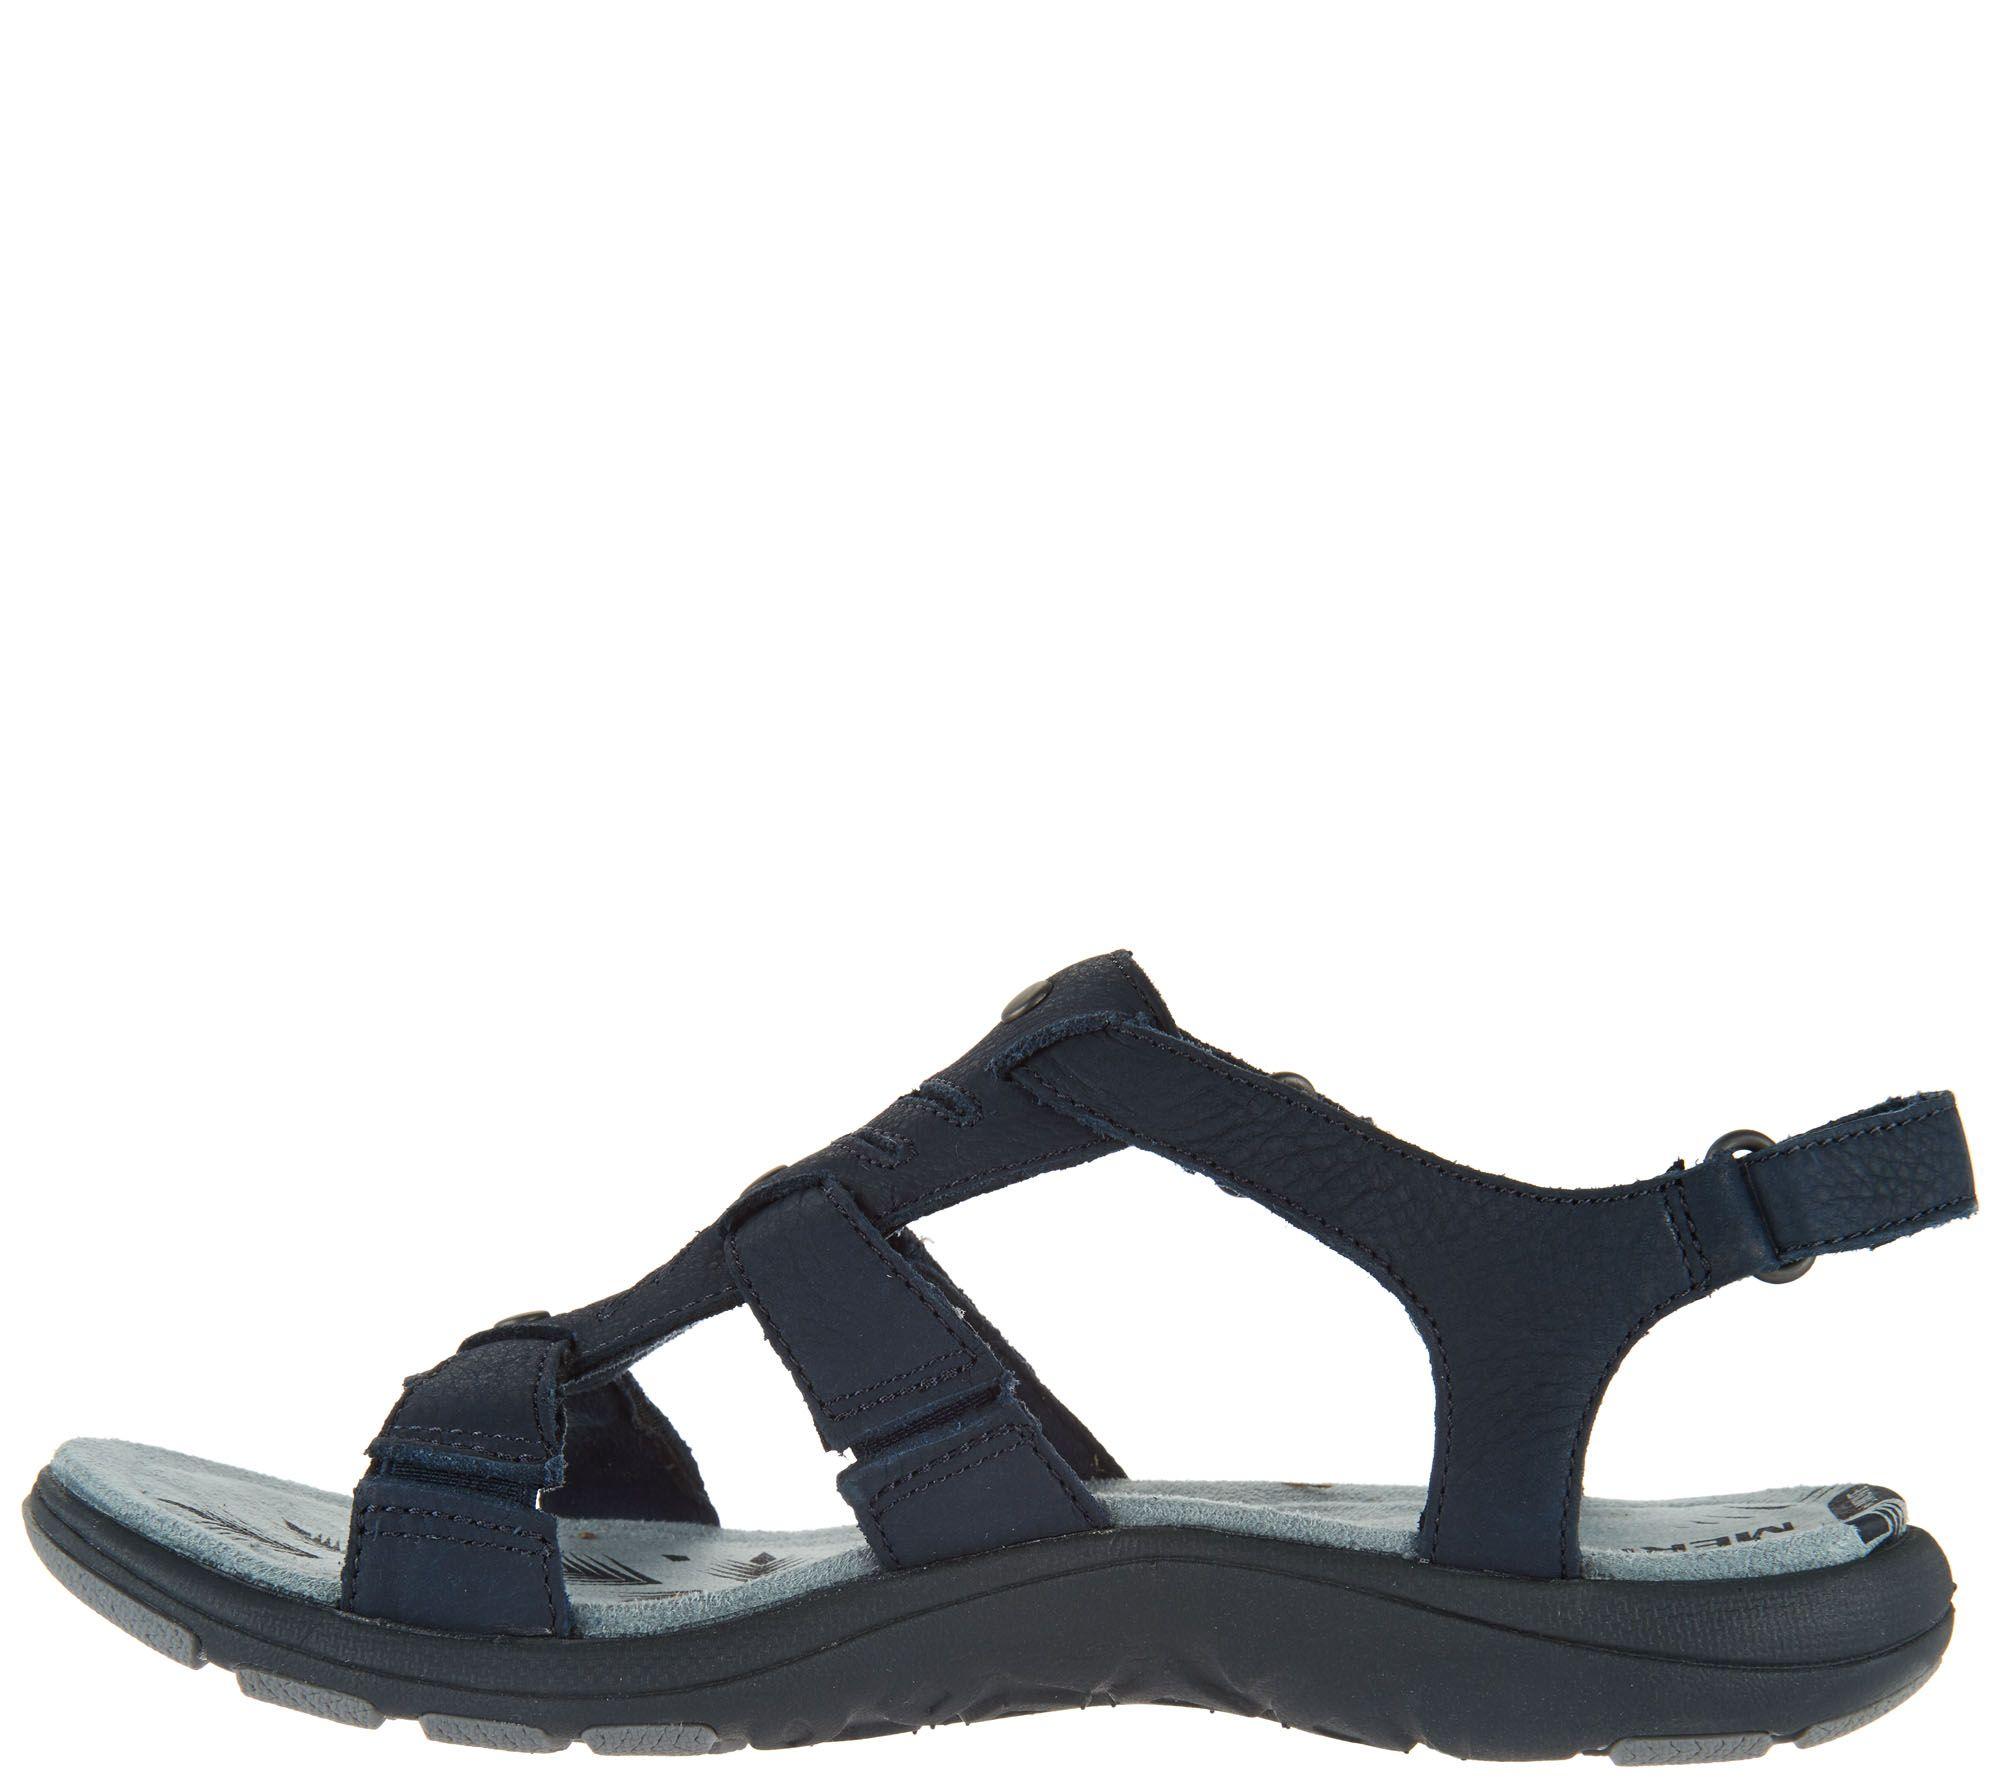 0b68455f6e4e Merrell Triple Strap Leather Sandals - Adhera Three Strap II - Page 1 —  QVC.com